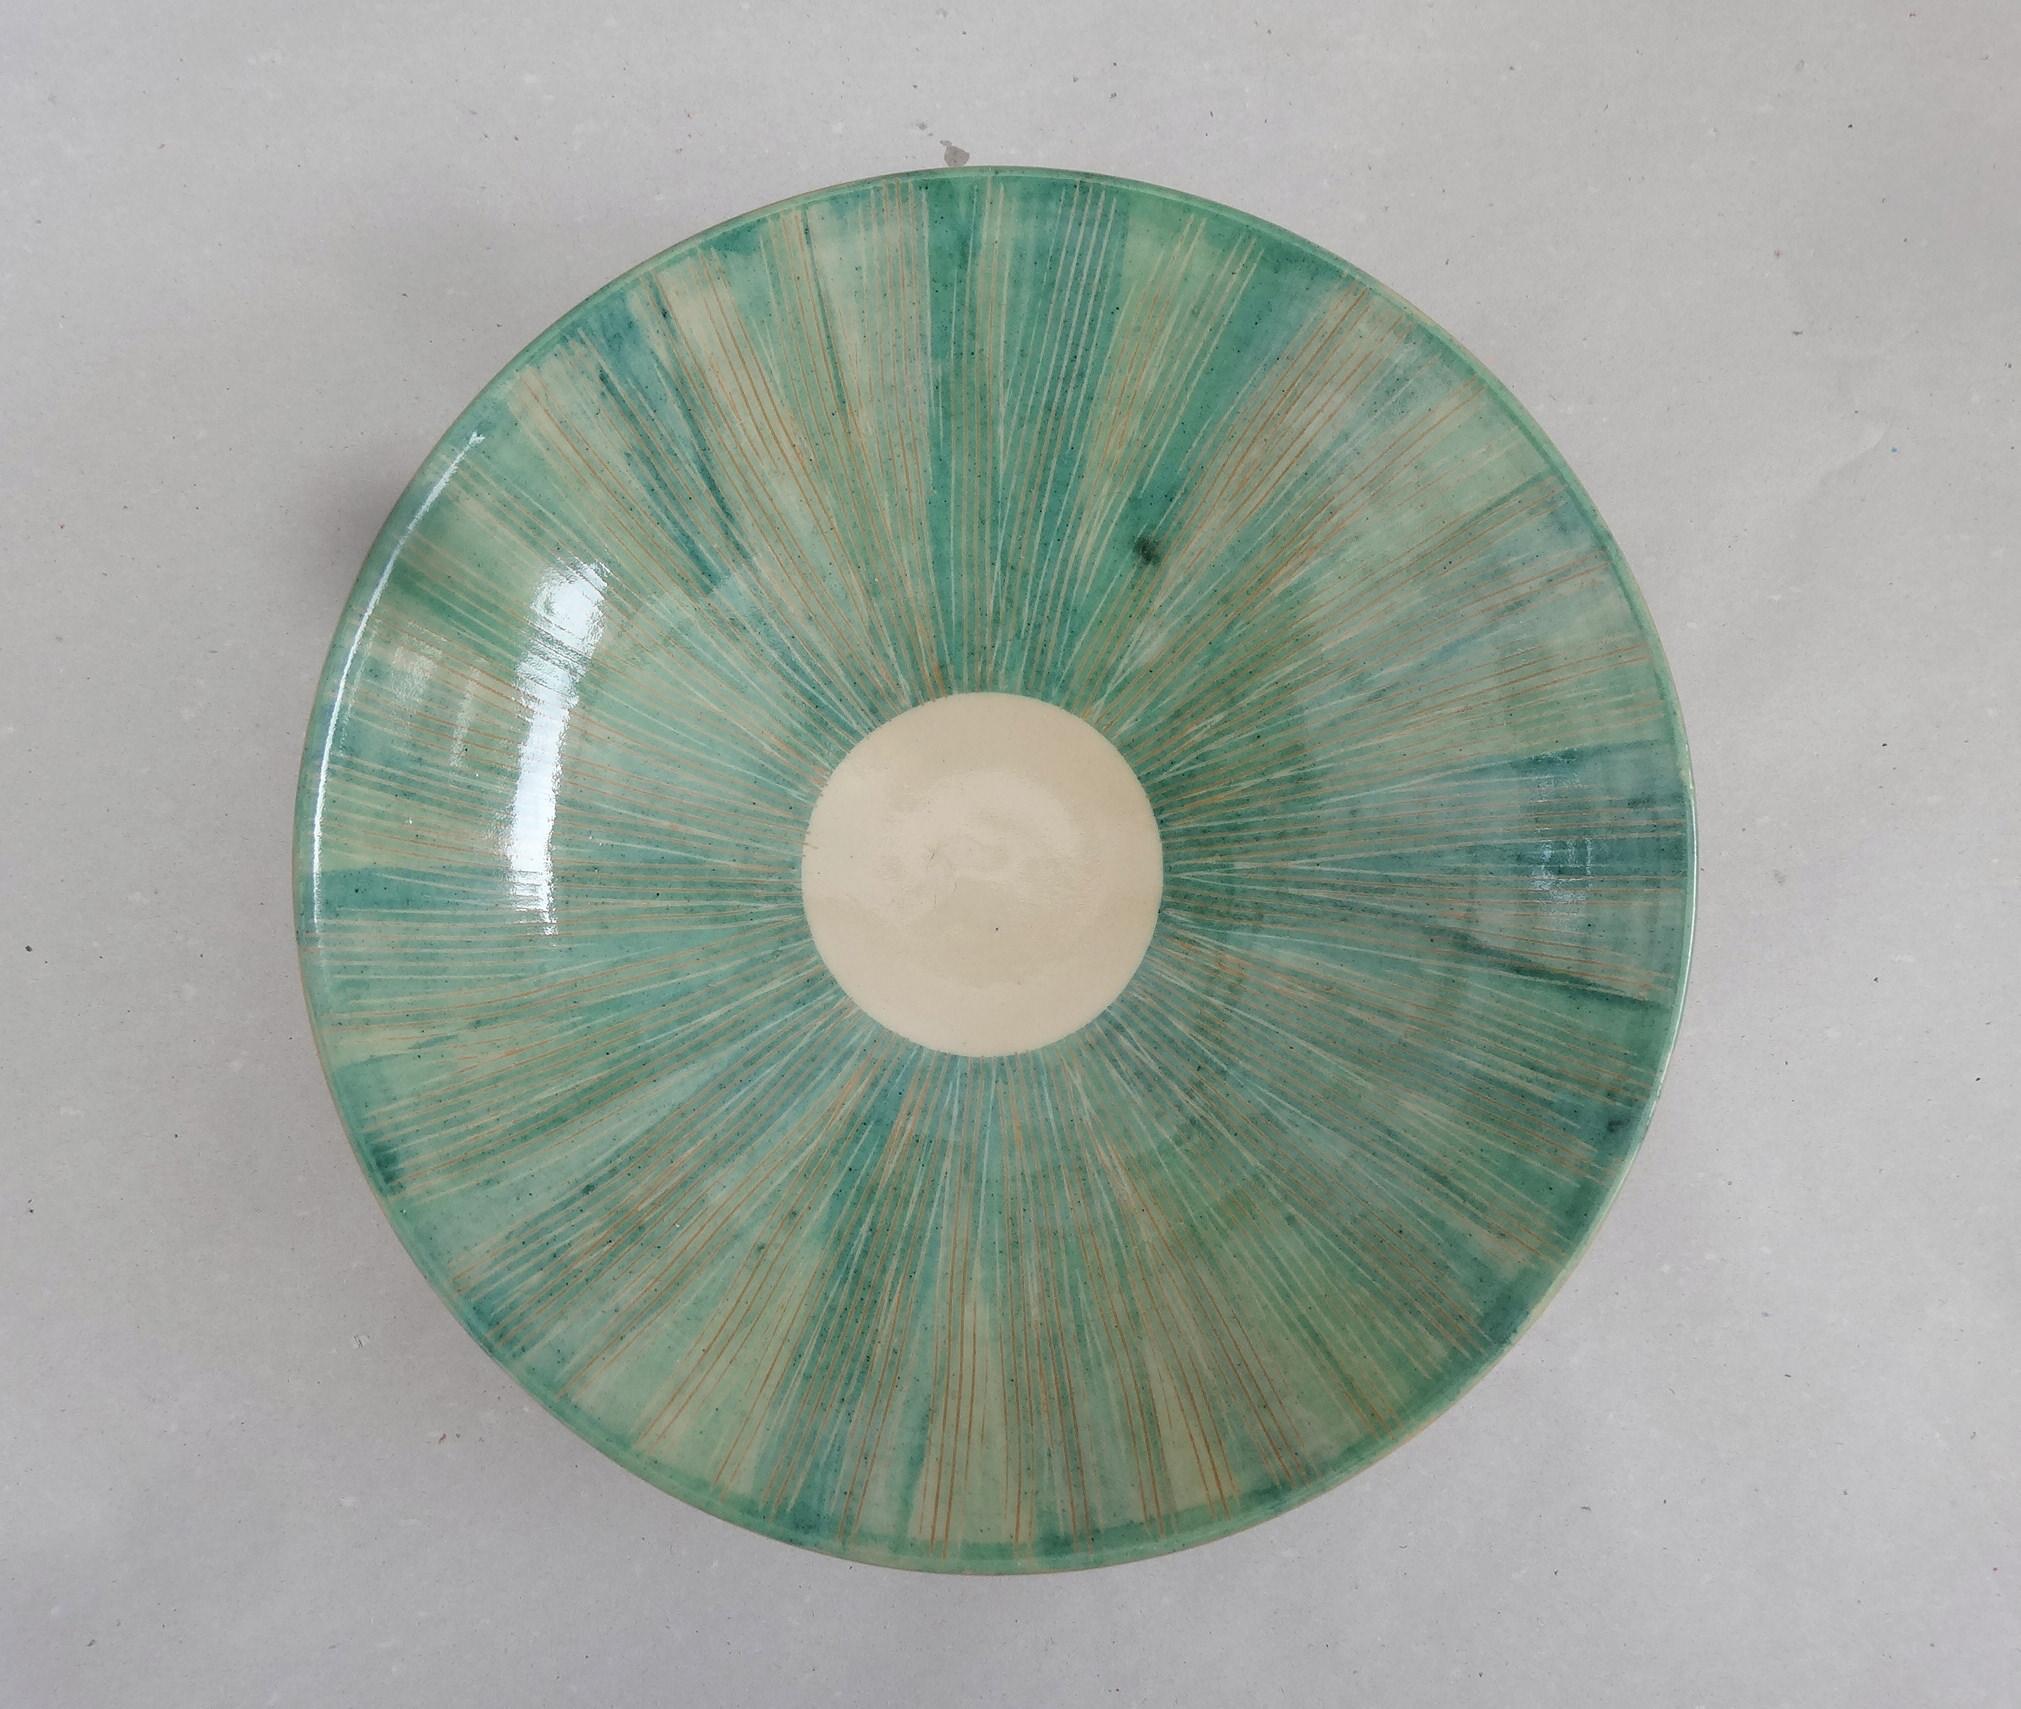 Tiefer Teller mintgrün gekämmt, 21 u. 23,5 cm